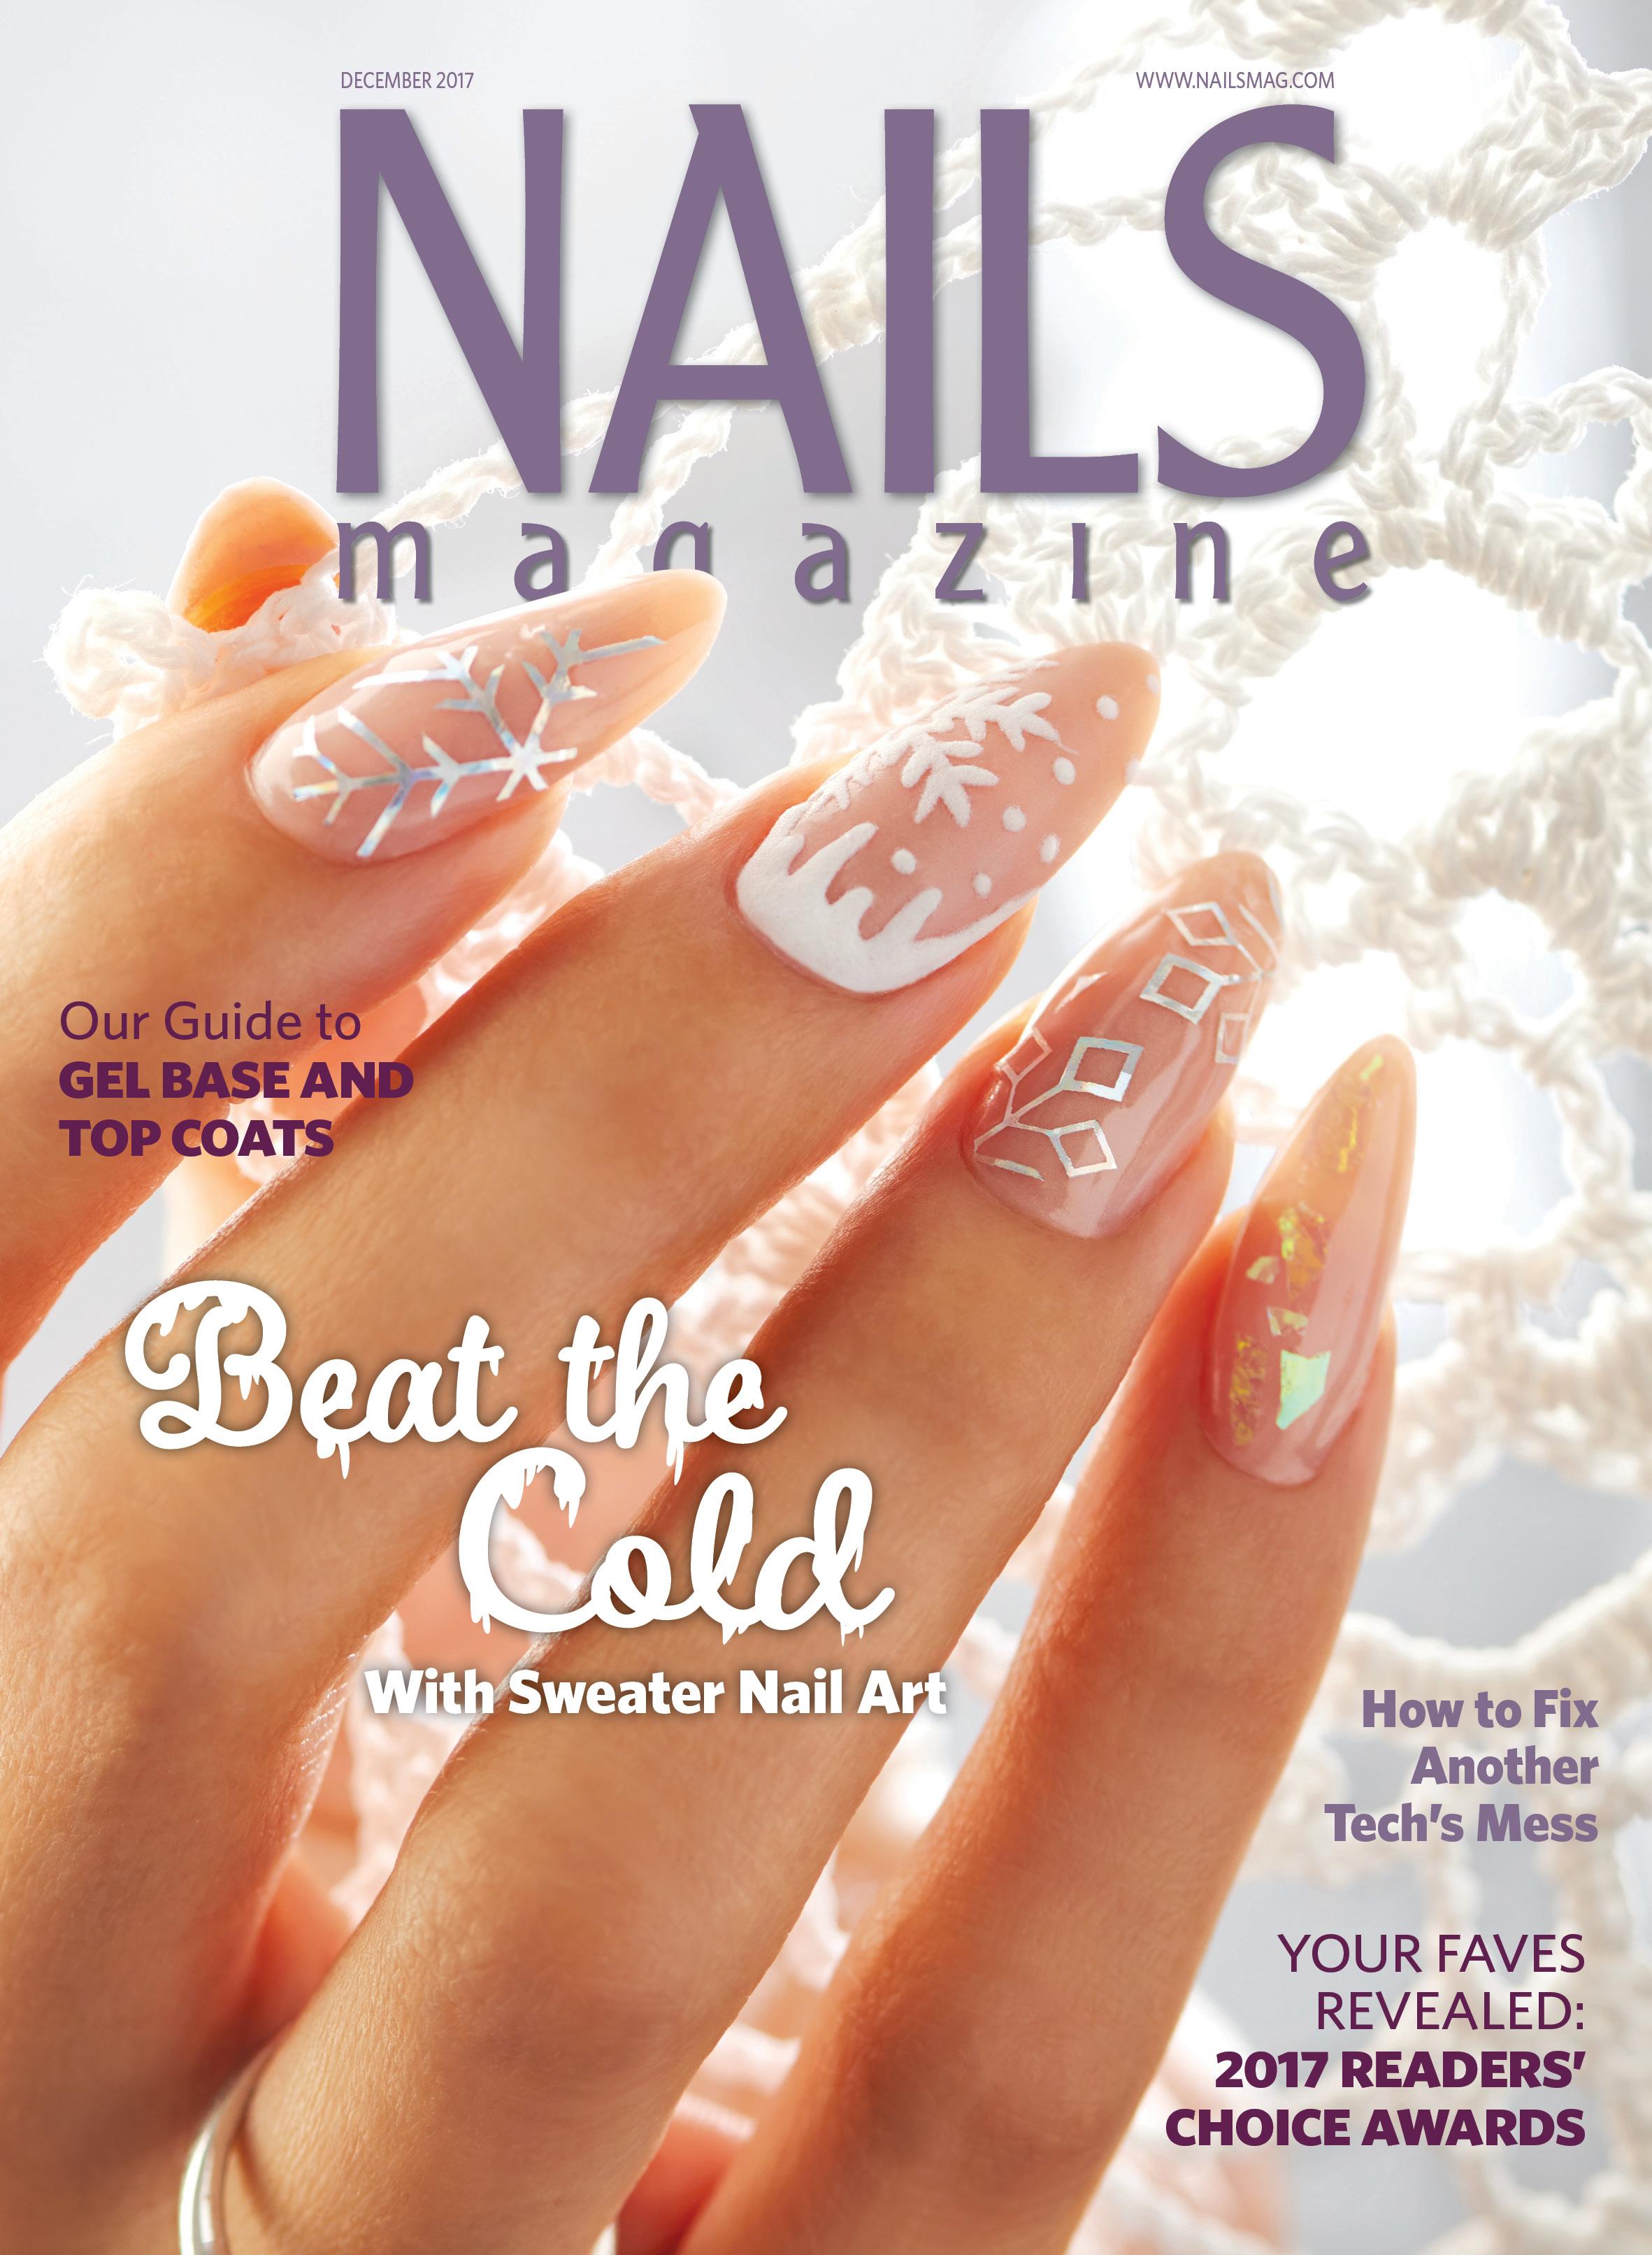 NAILS Magazine | December 2017 Issue